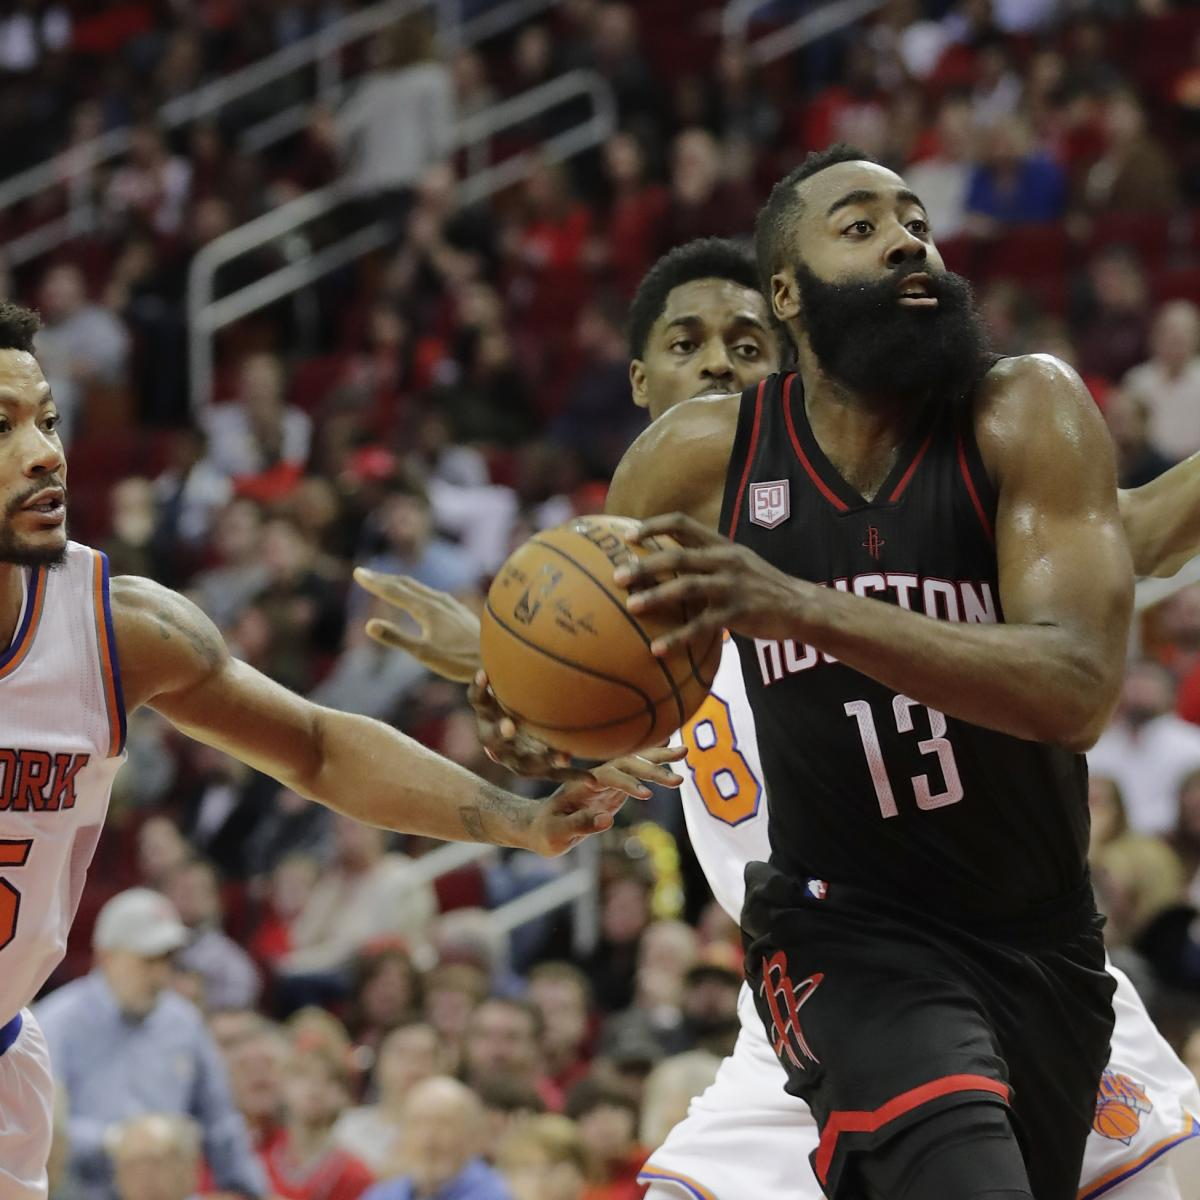 James Harden Nba Records: James Harden Vs. Knicks: Stats, Highlights And Reaction